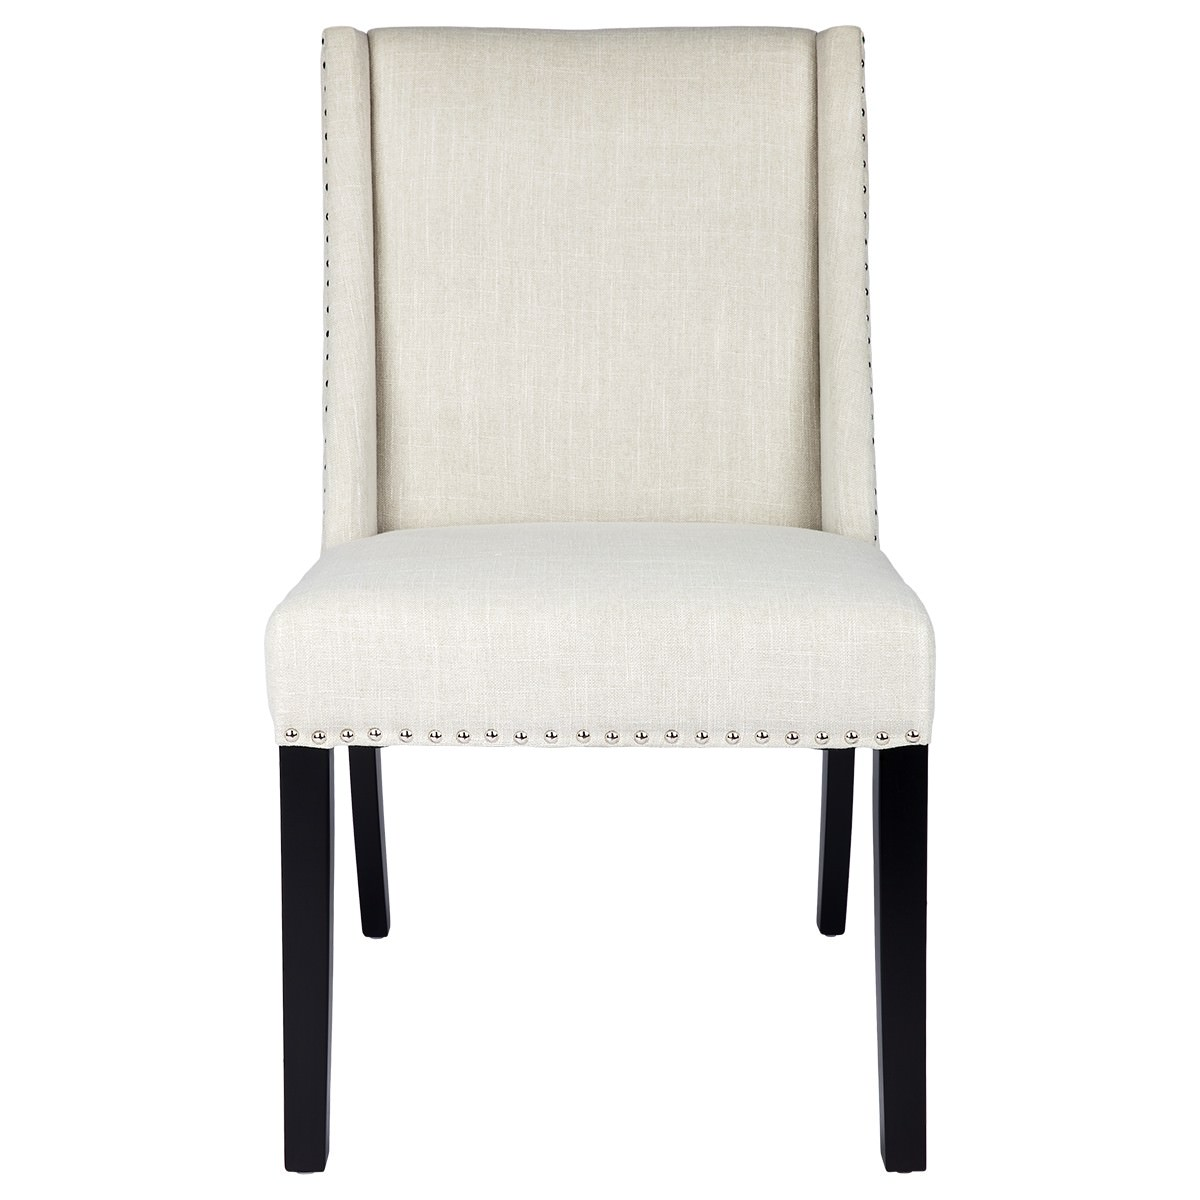 Braydon Fabric Dining Chair, Ivory